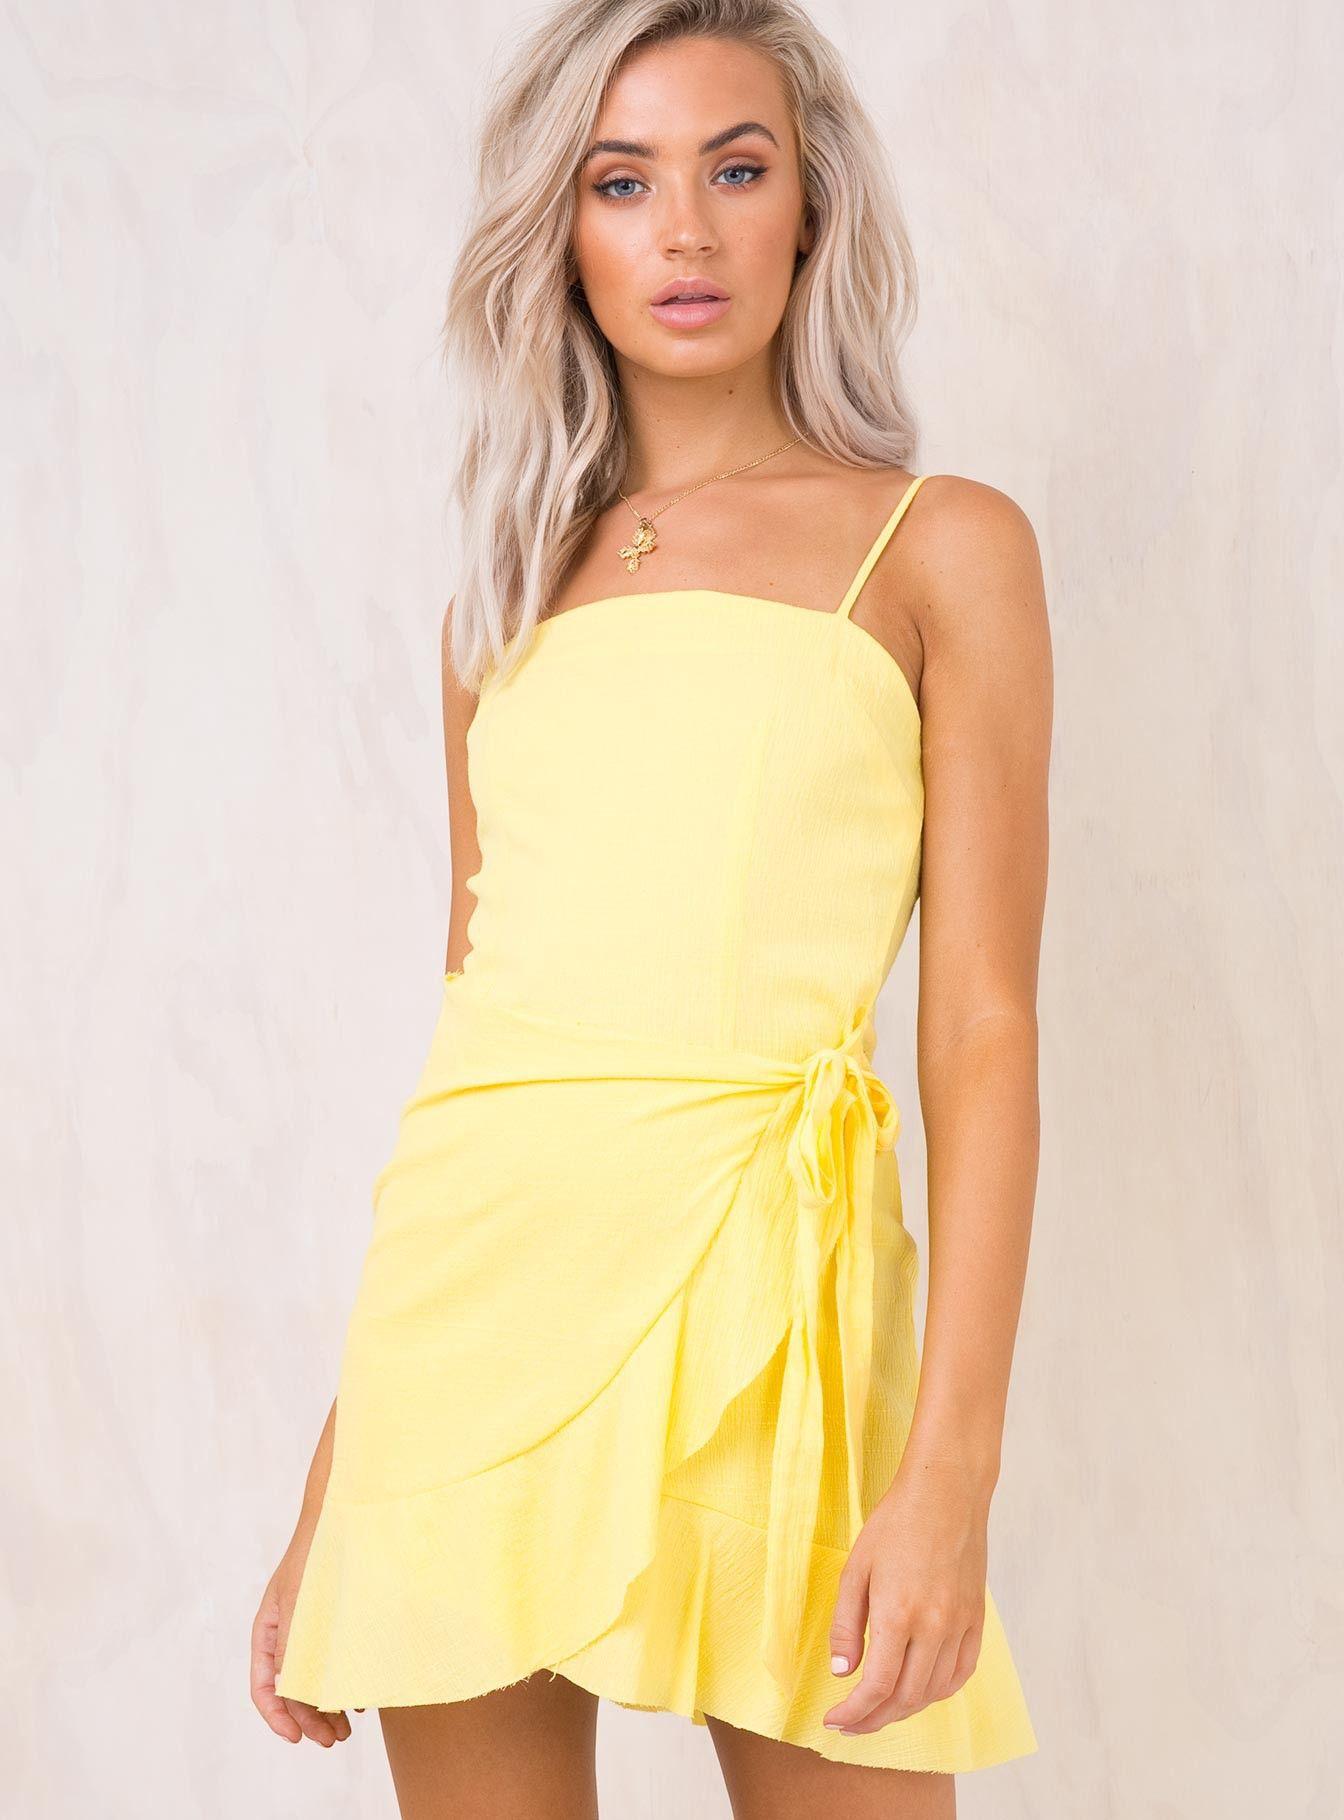 1576bd7d9a Rosanna+Mini+Dress+Lemon+-+ Mini+dress Exclusive+to+Princess+Polly  Straight+neckline Wrap+style+skirt+with+tie+at+side  Adjustable+shoulder+straps ...